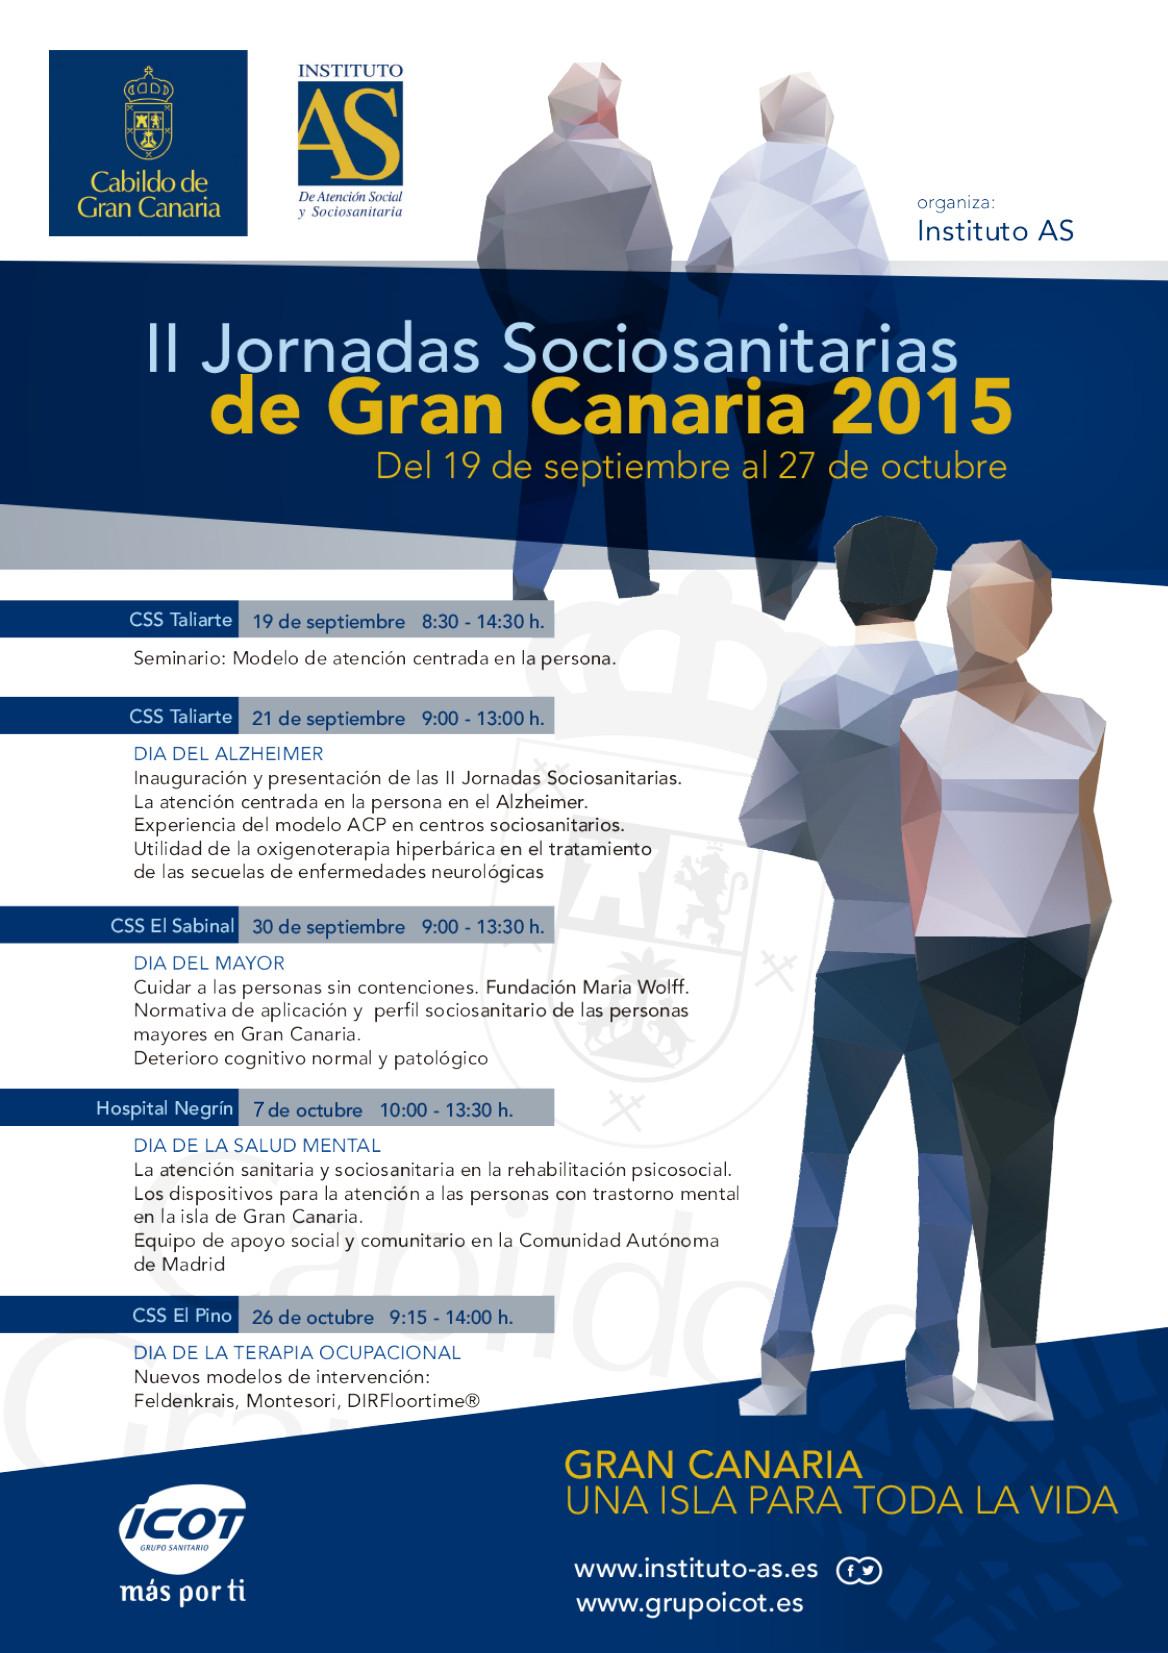 II Jornadas Sociosanitarias de Gran Canaria 2015